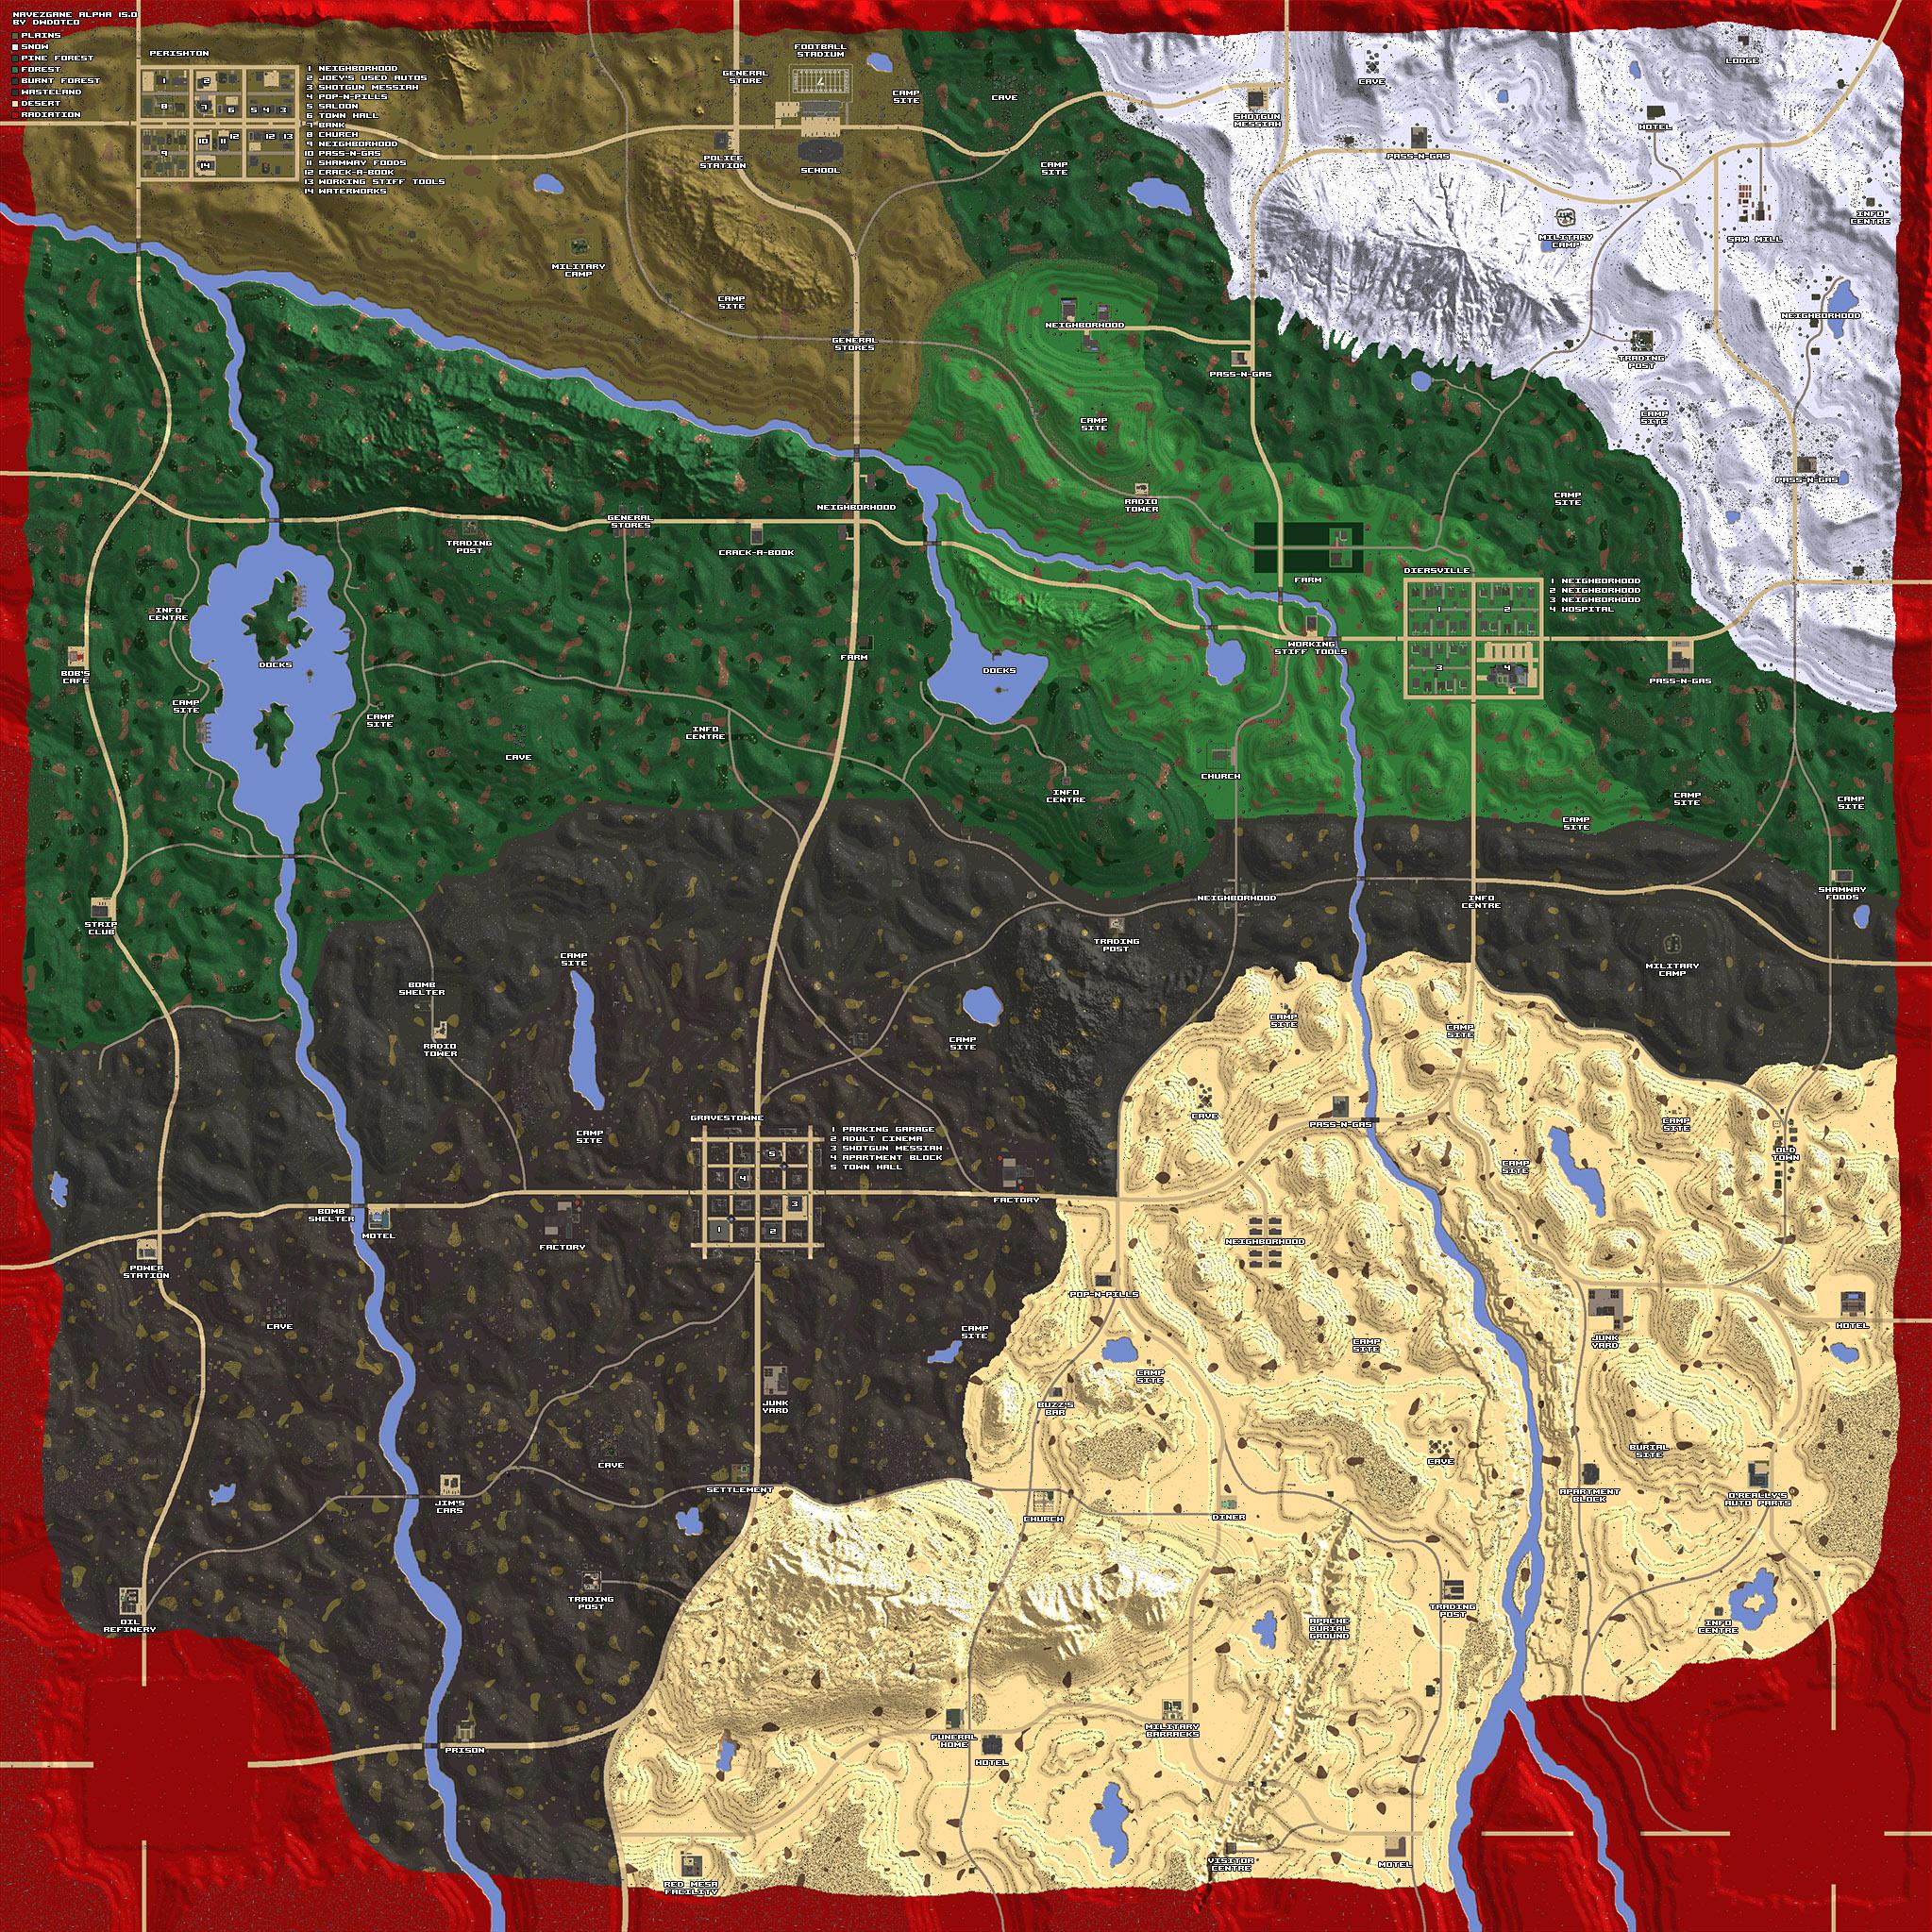 7 days to die carte Steam Community :: Guide :: Navezgane Alpha 15 POI Map